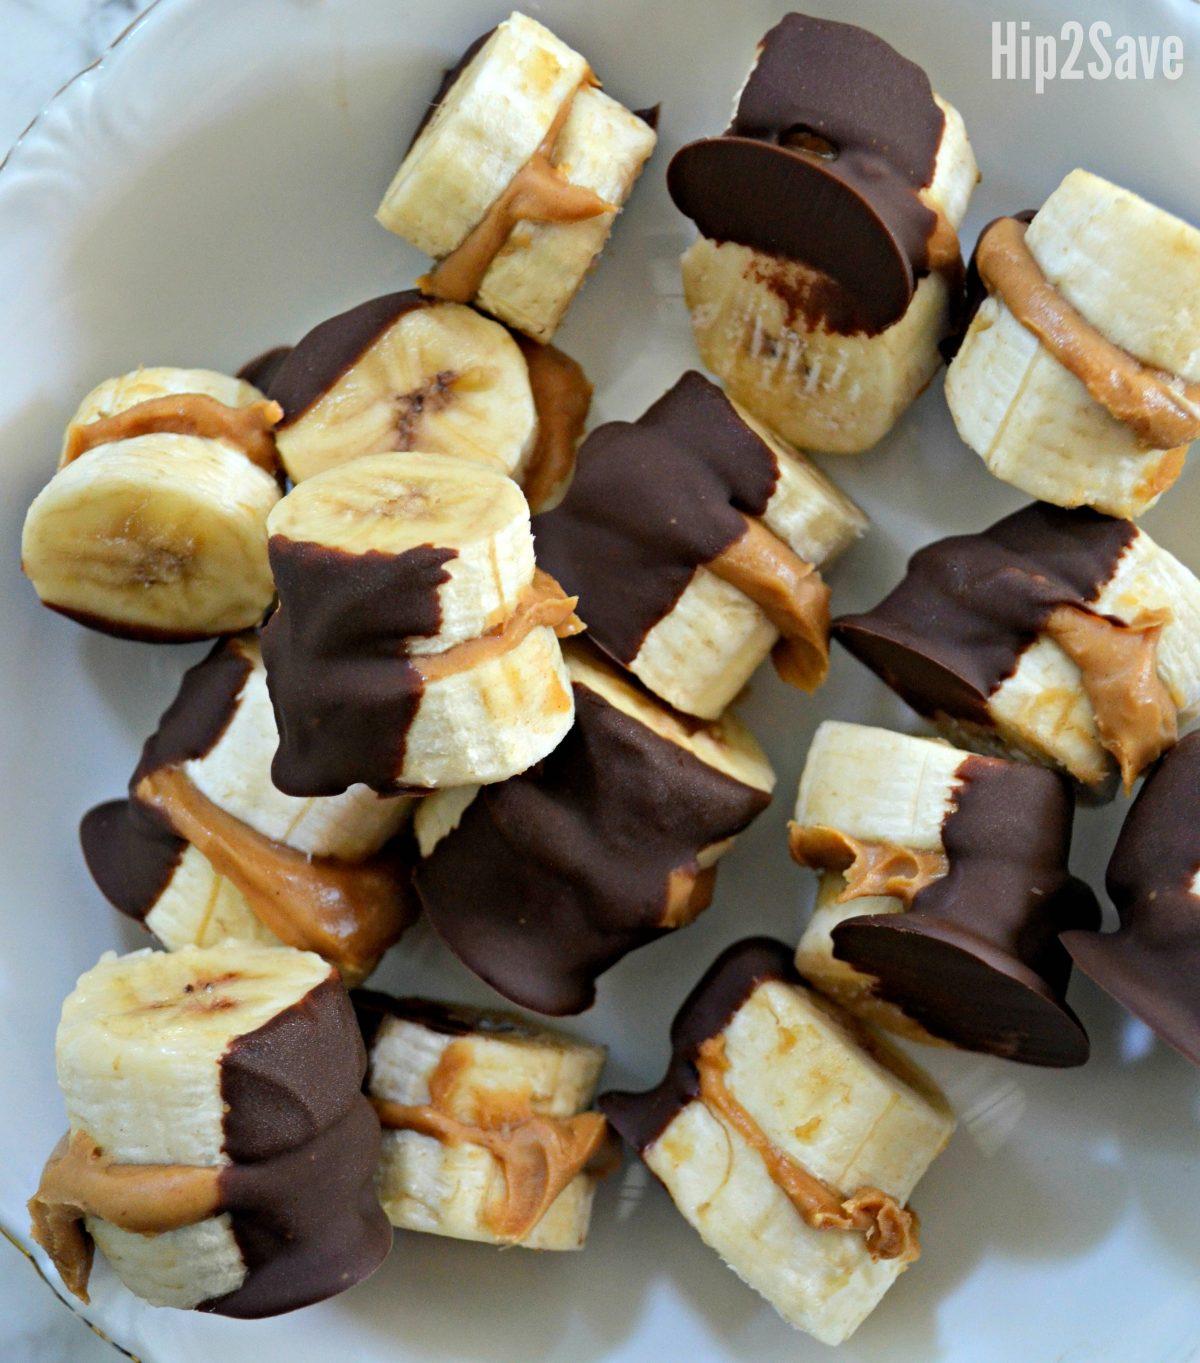 peanut butter banana bites after freezing